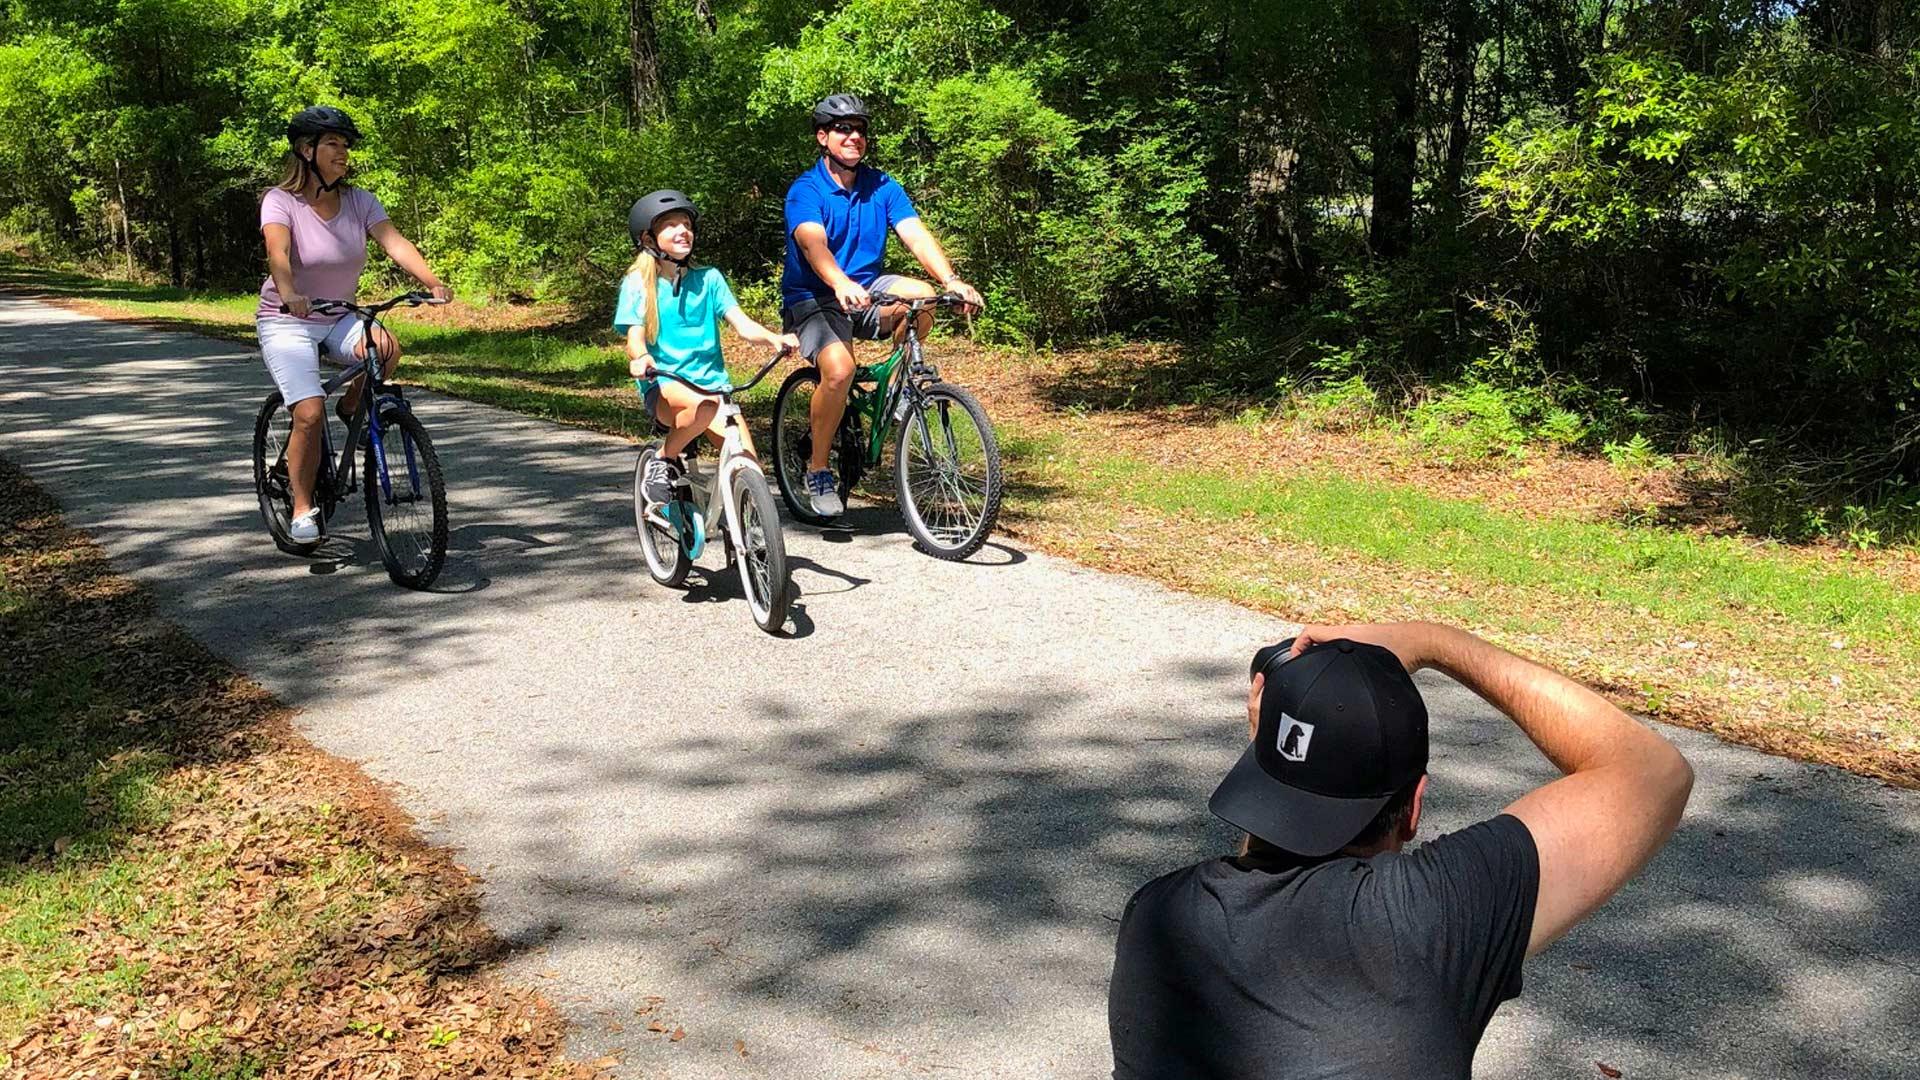 Family bike riding video shoot in Suwannee County